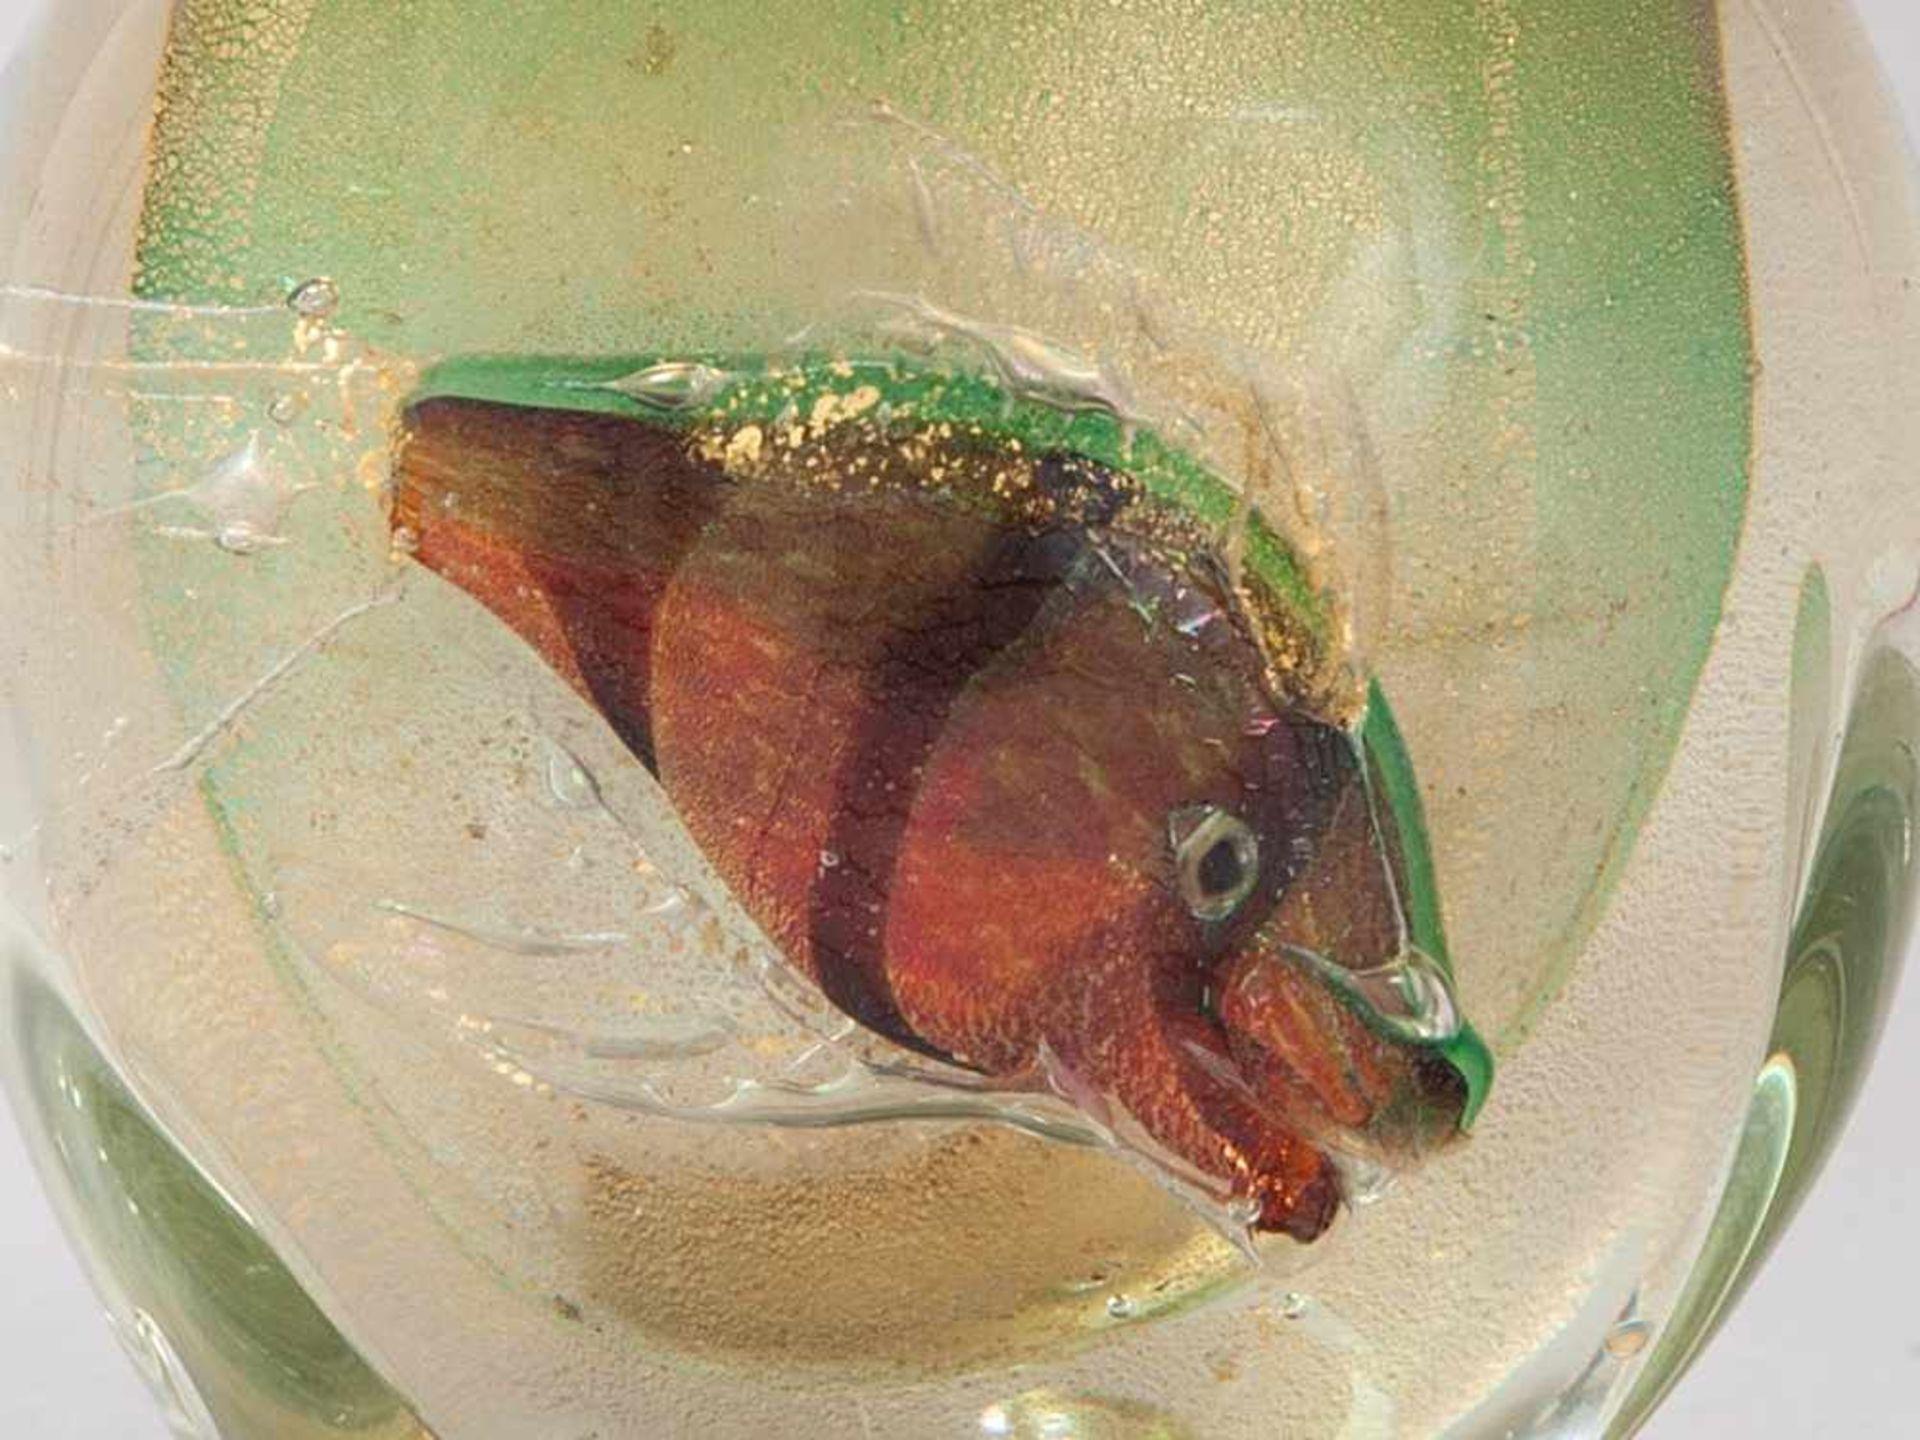 Los 107 - Murano Table Lighter, Italy, c. 1950 Italy, c. 1950. Murano glass in aquarium style Opaque,